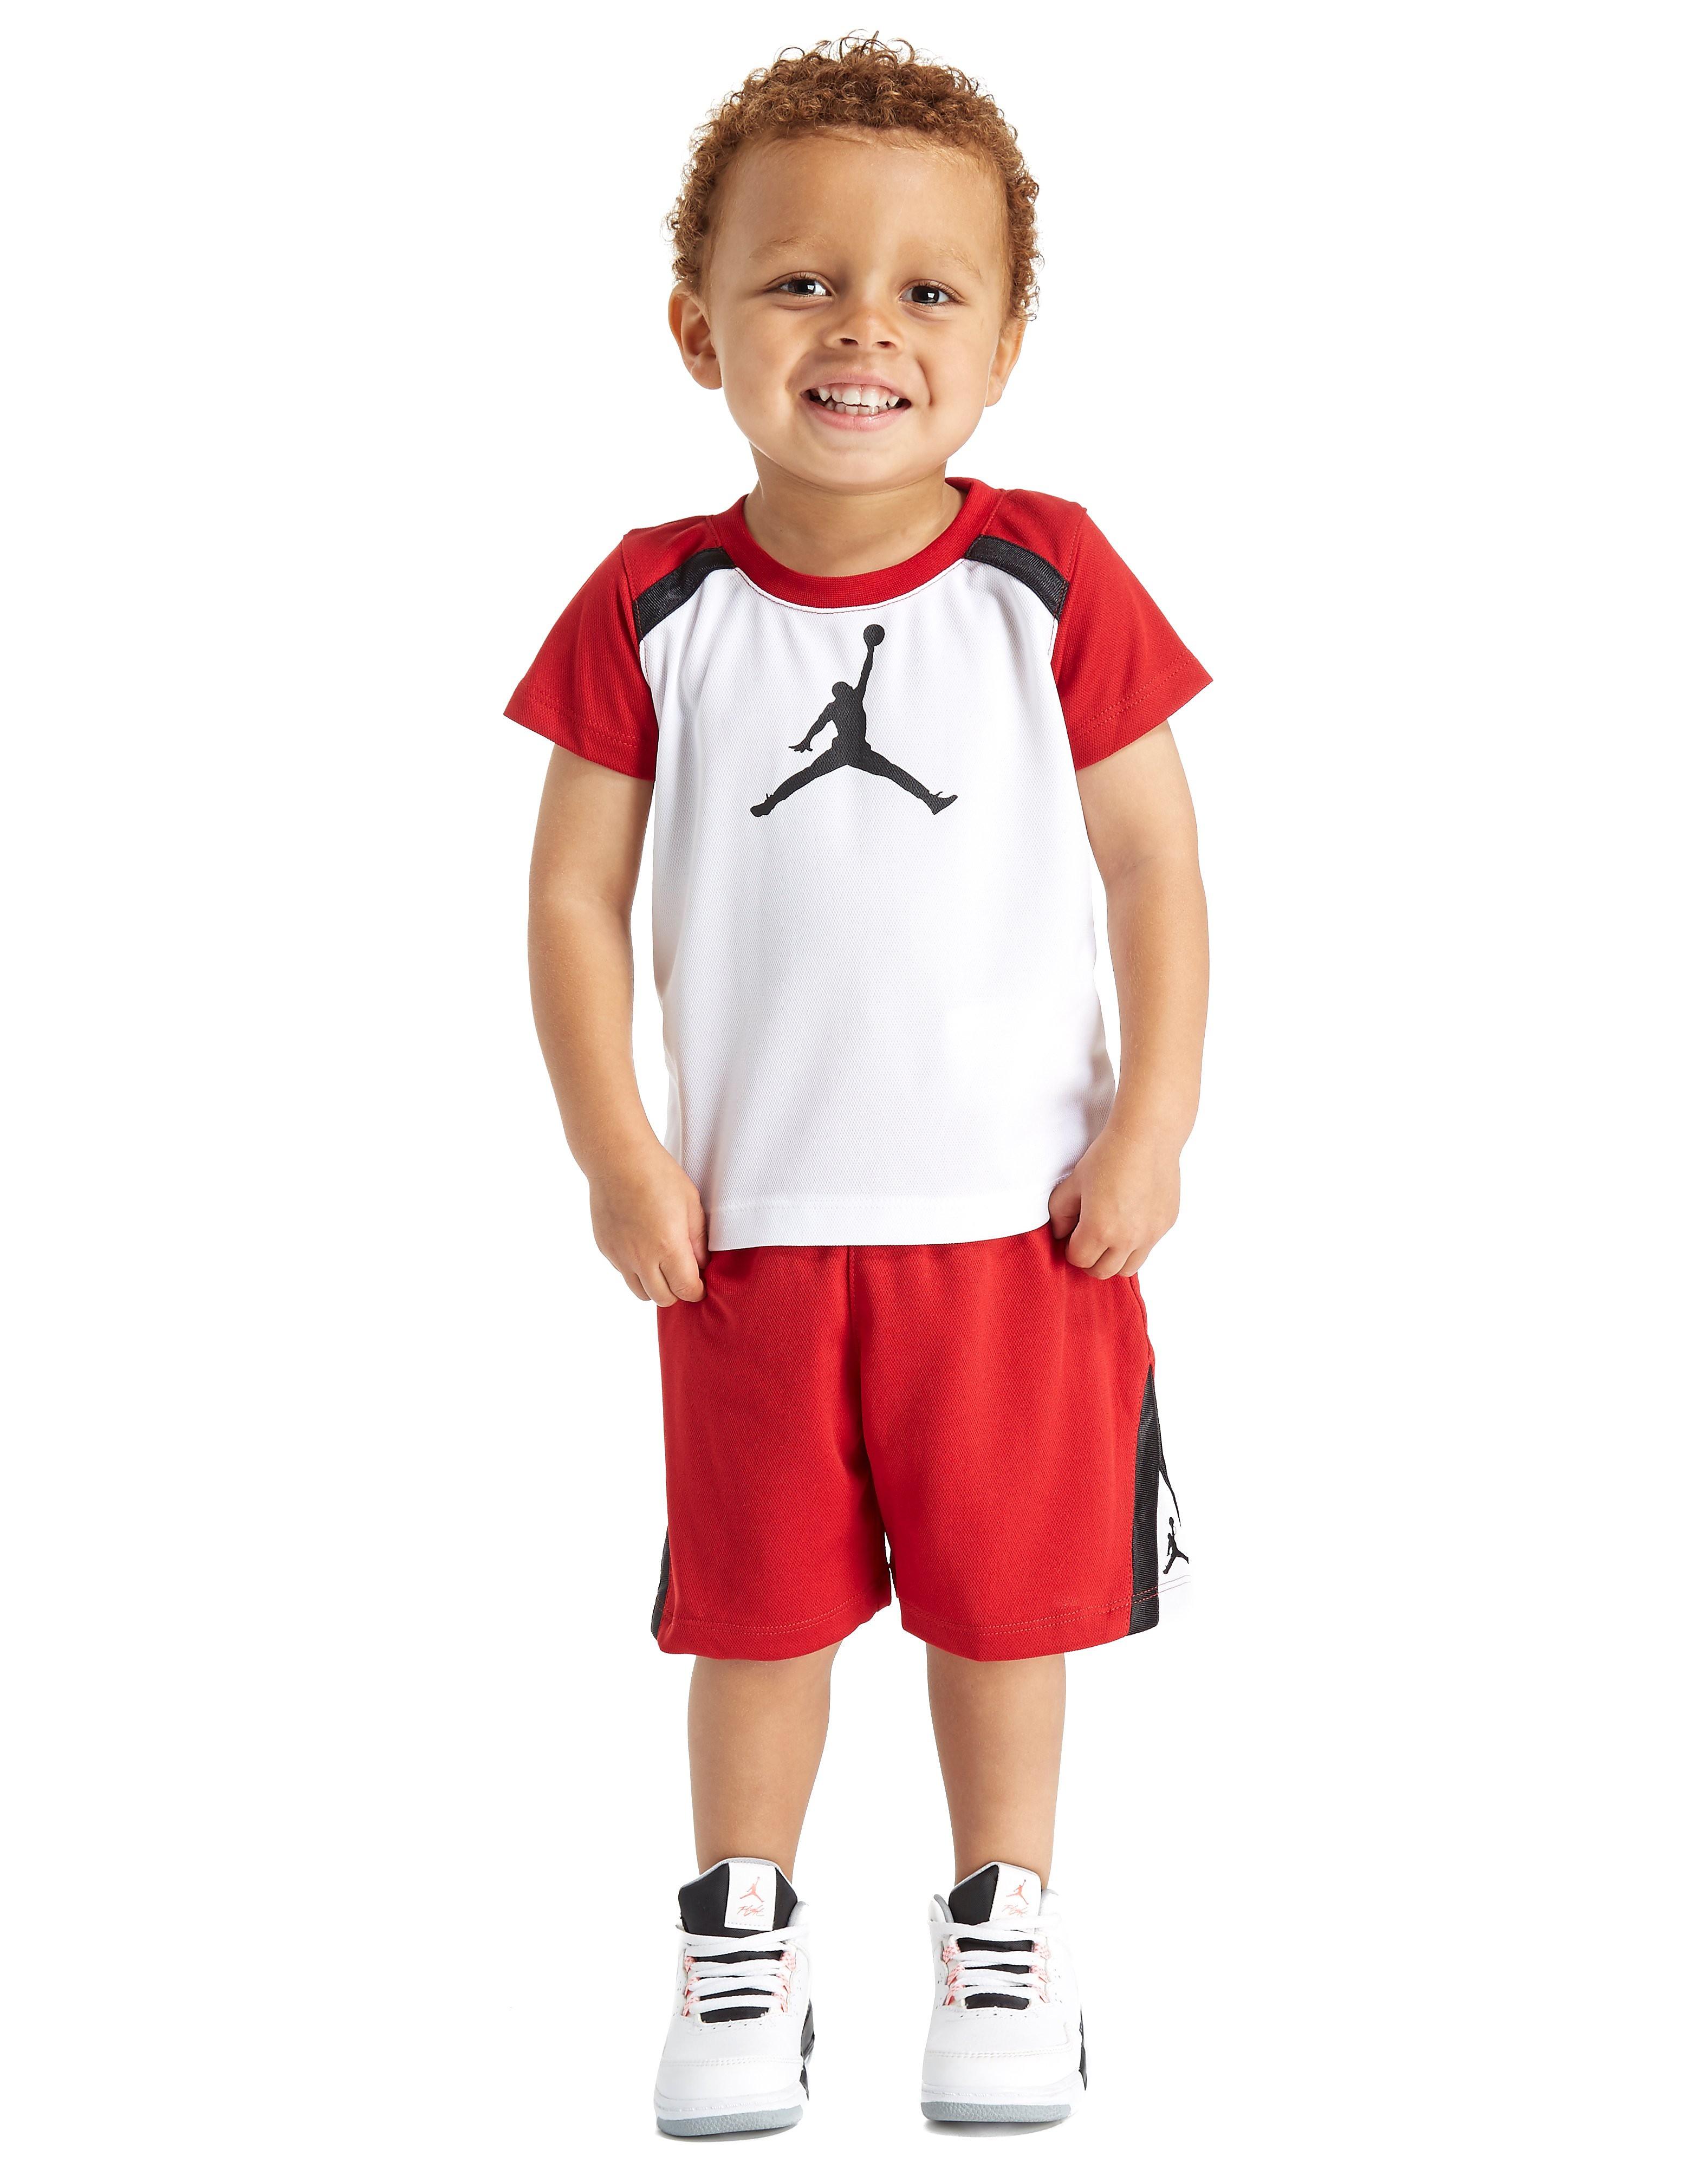 Jordan Court T-Shirt and Shorts Set